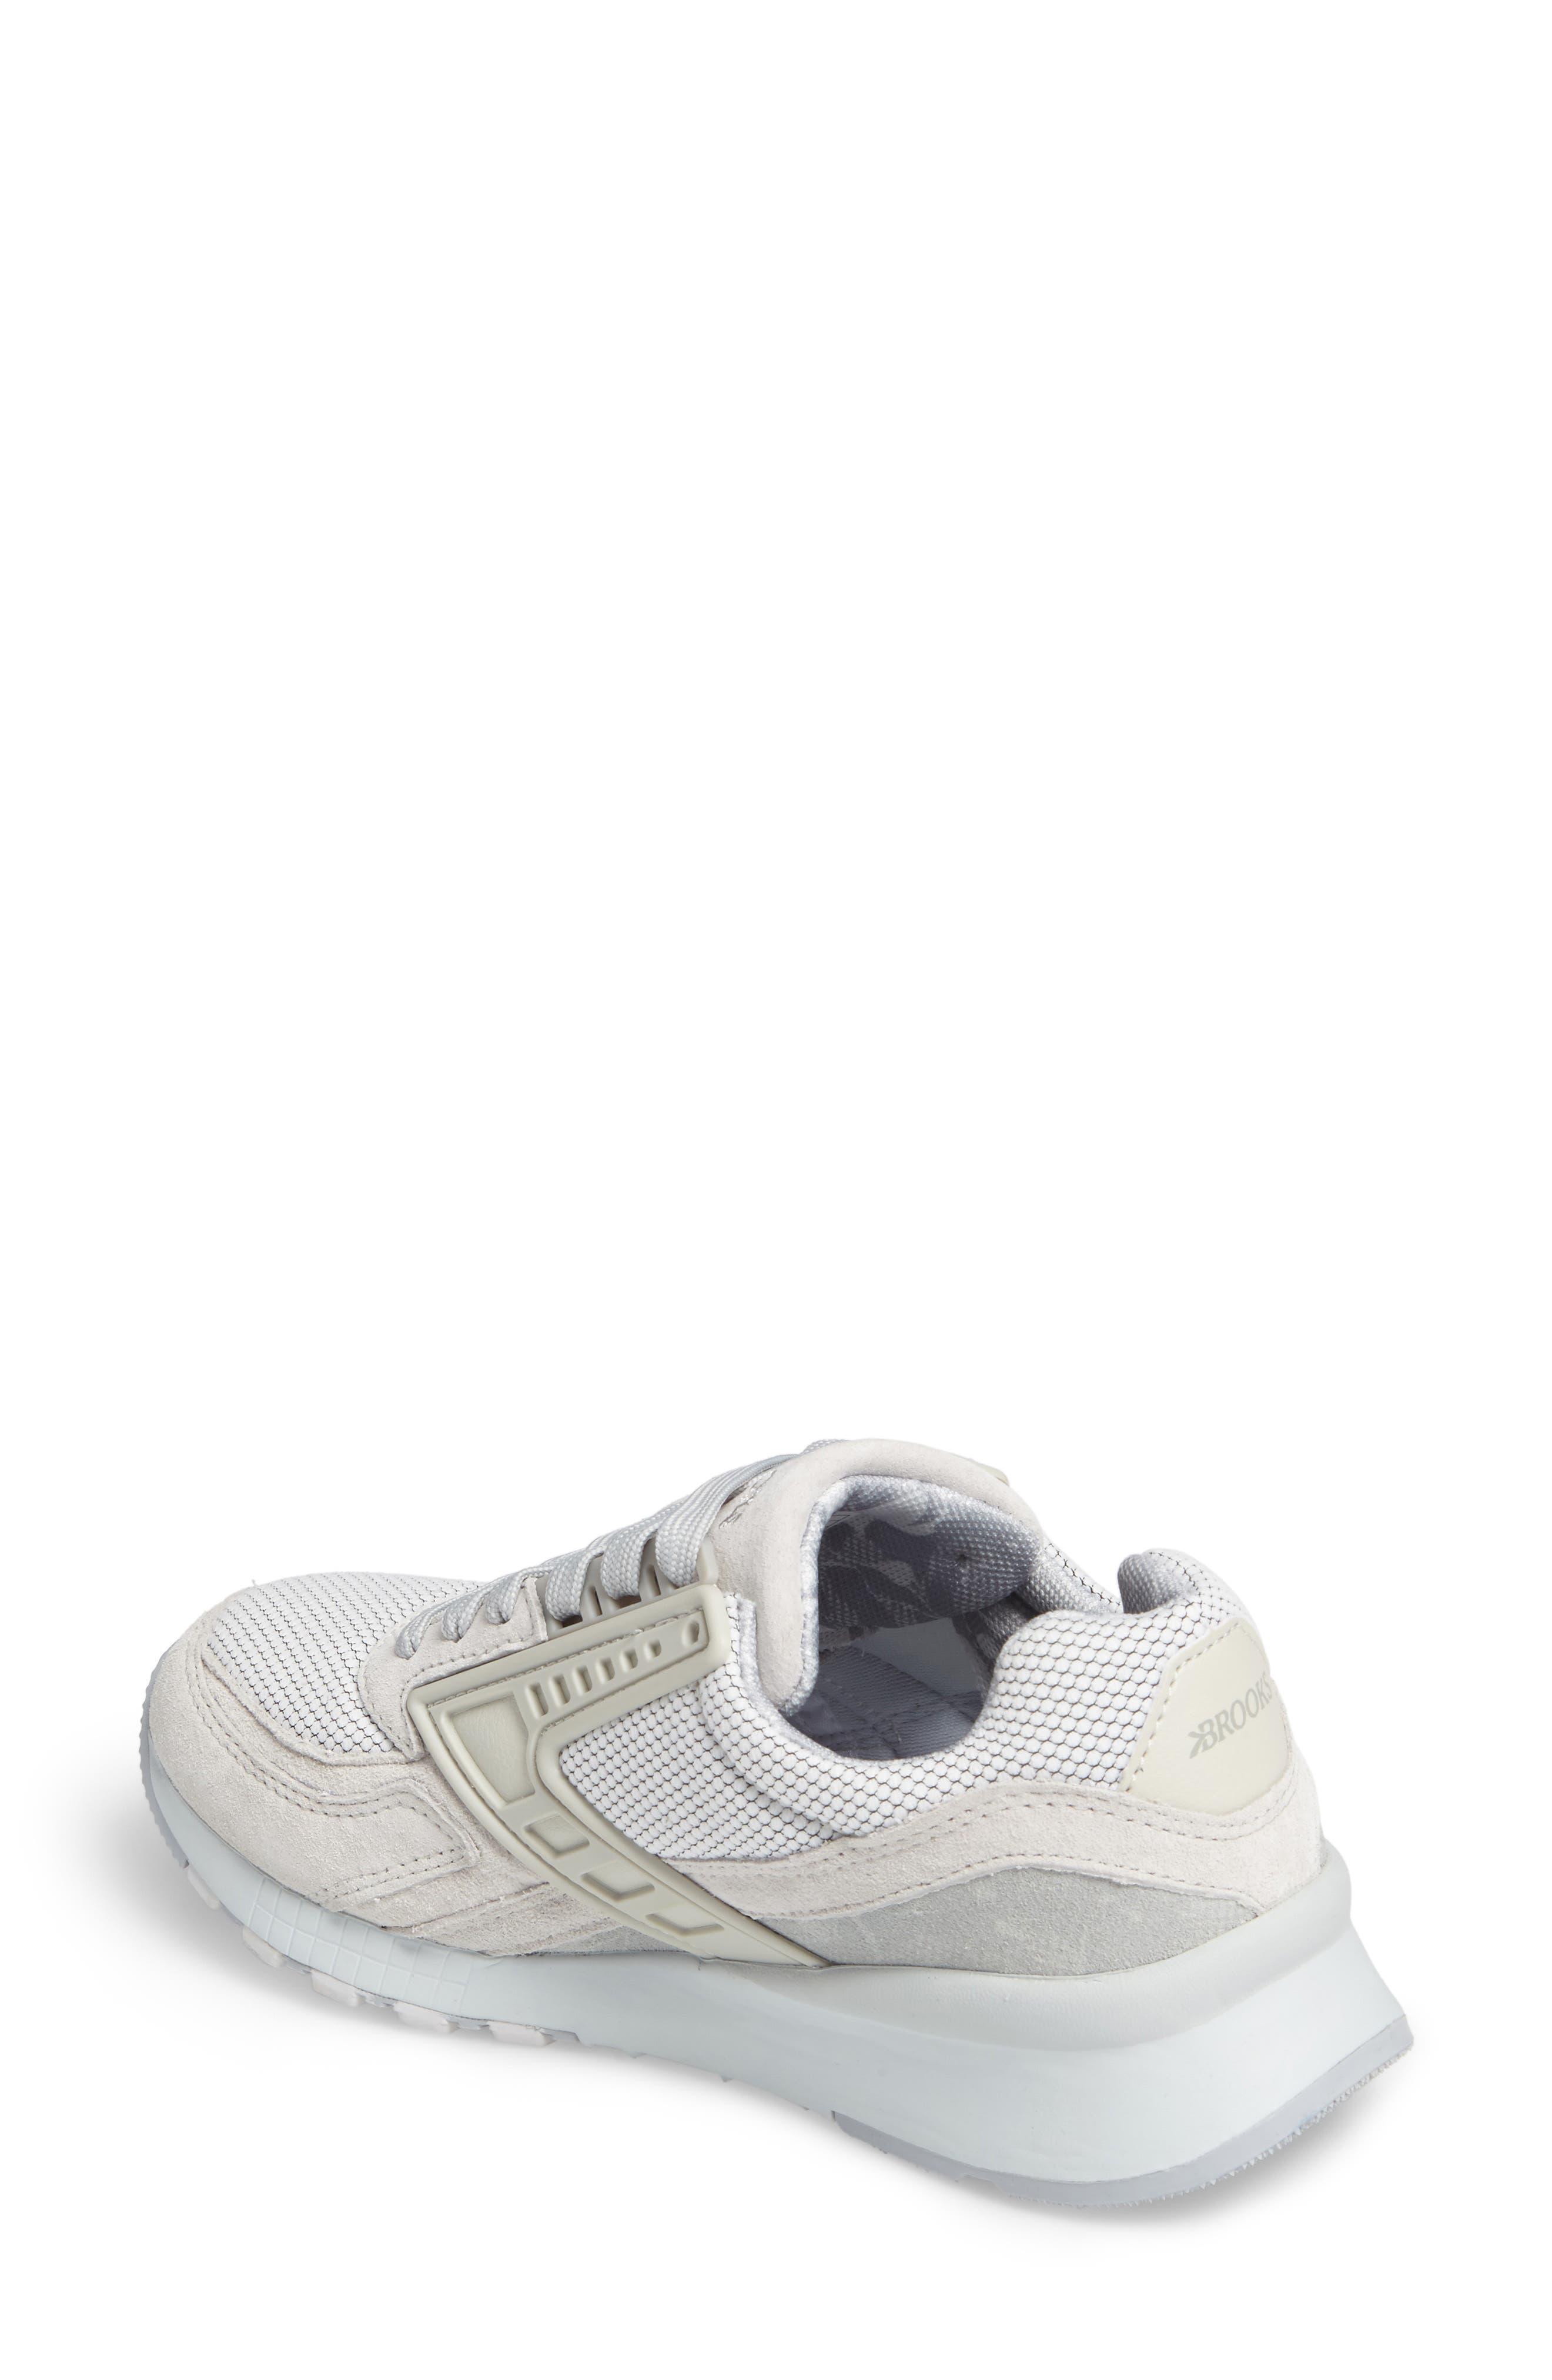 Alternate Image 2  - Brooks 'Evenfall Regent' Sneaker (Women)